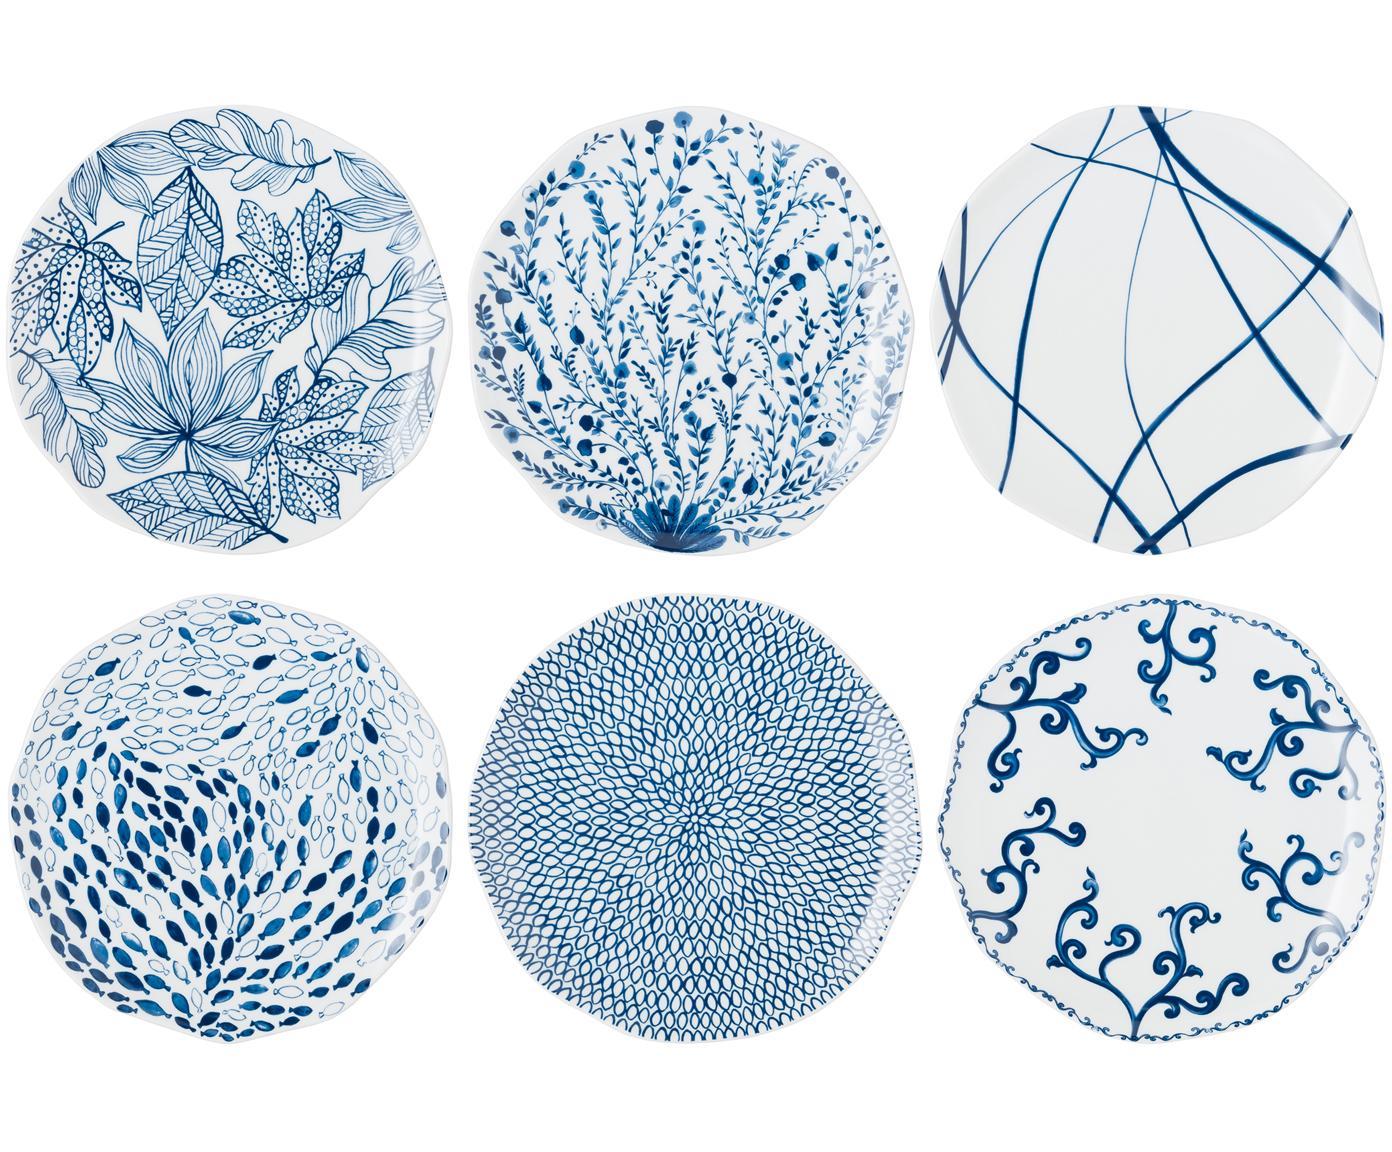 Set piatti piani Vassoio 6 pz, Porcellana, Blu, bianco, Ø 27 cm